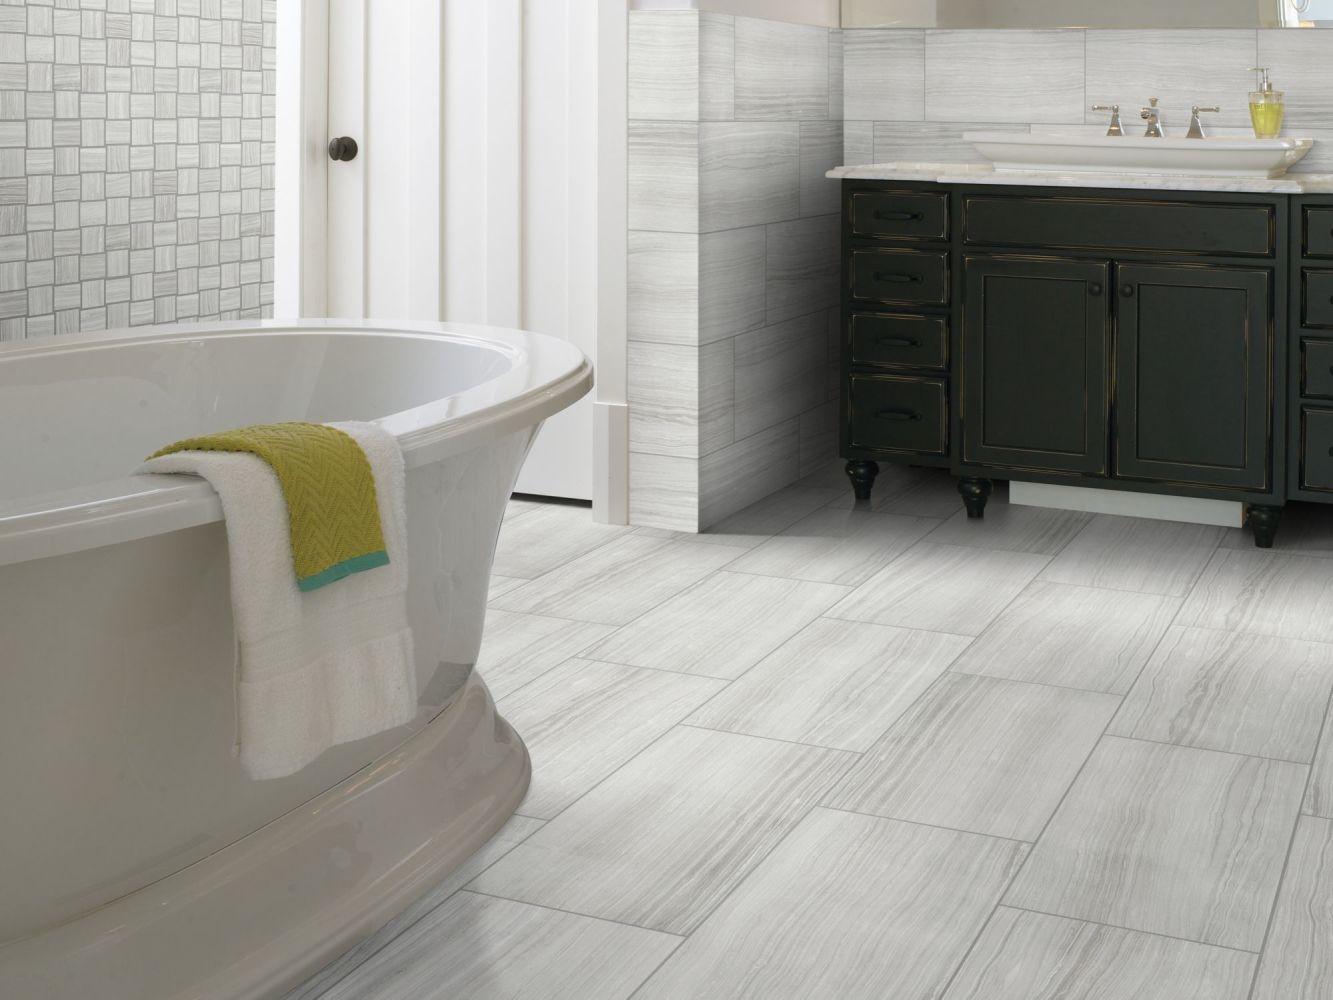 Shaw Floors Home Fn Gold Ceramic Lockport Bn Glacier 00510_TGM02